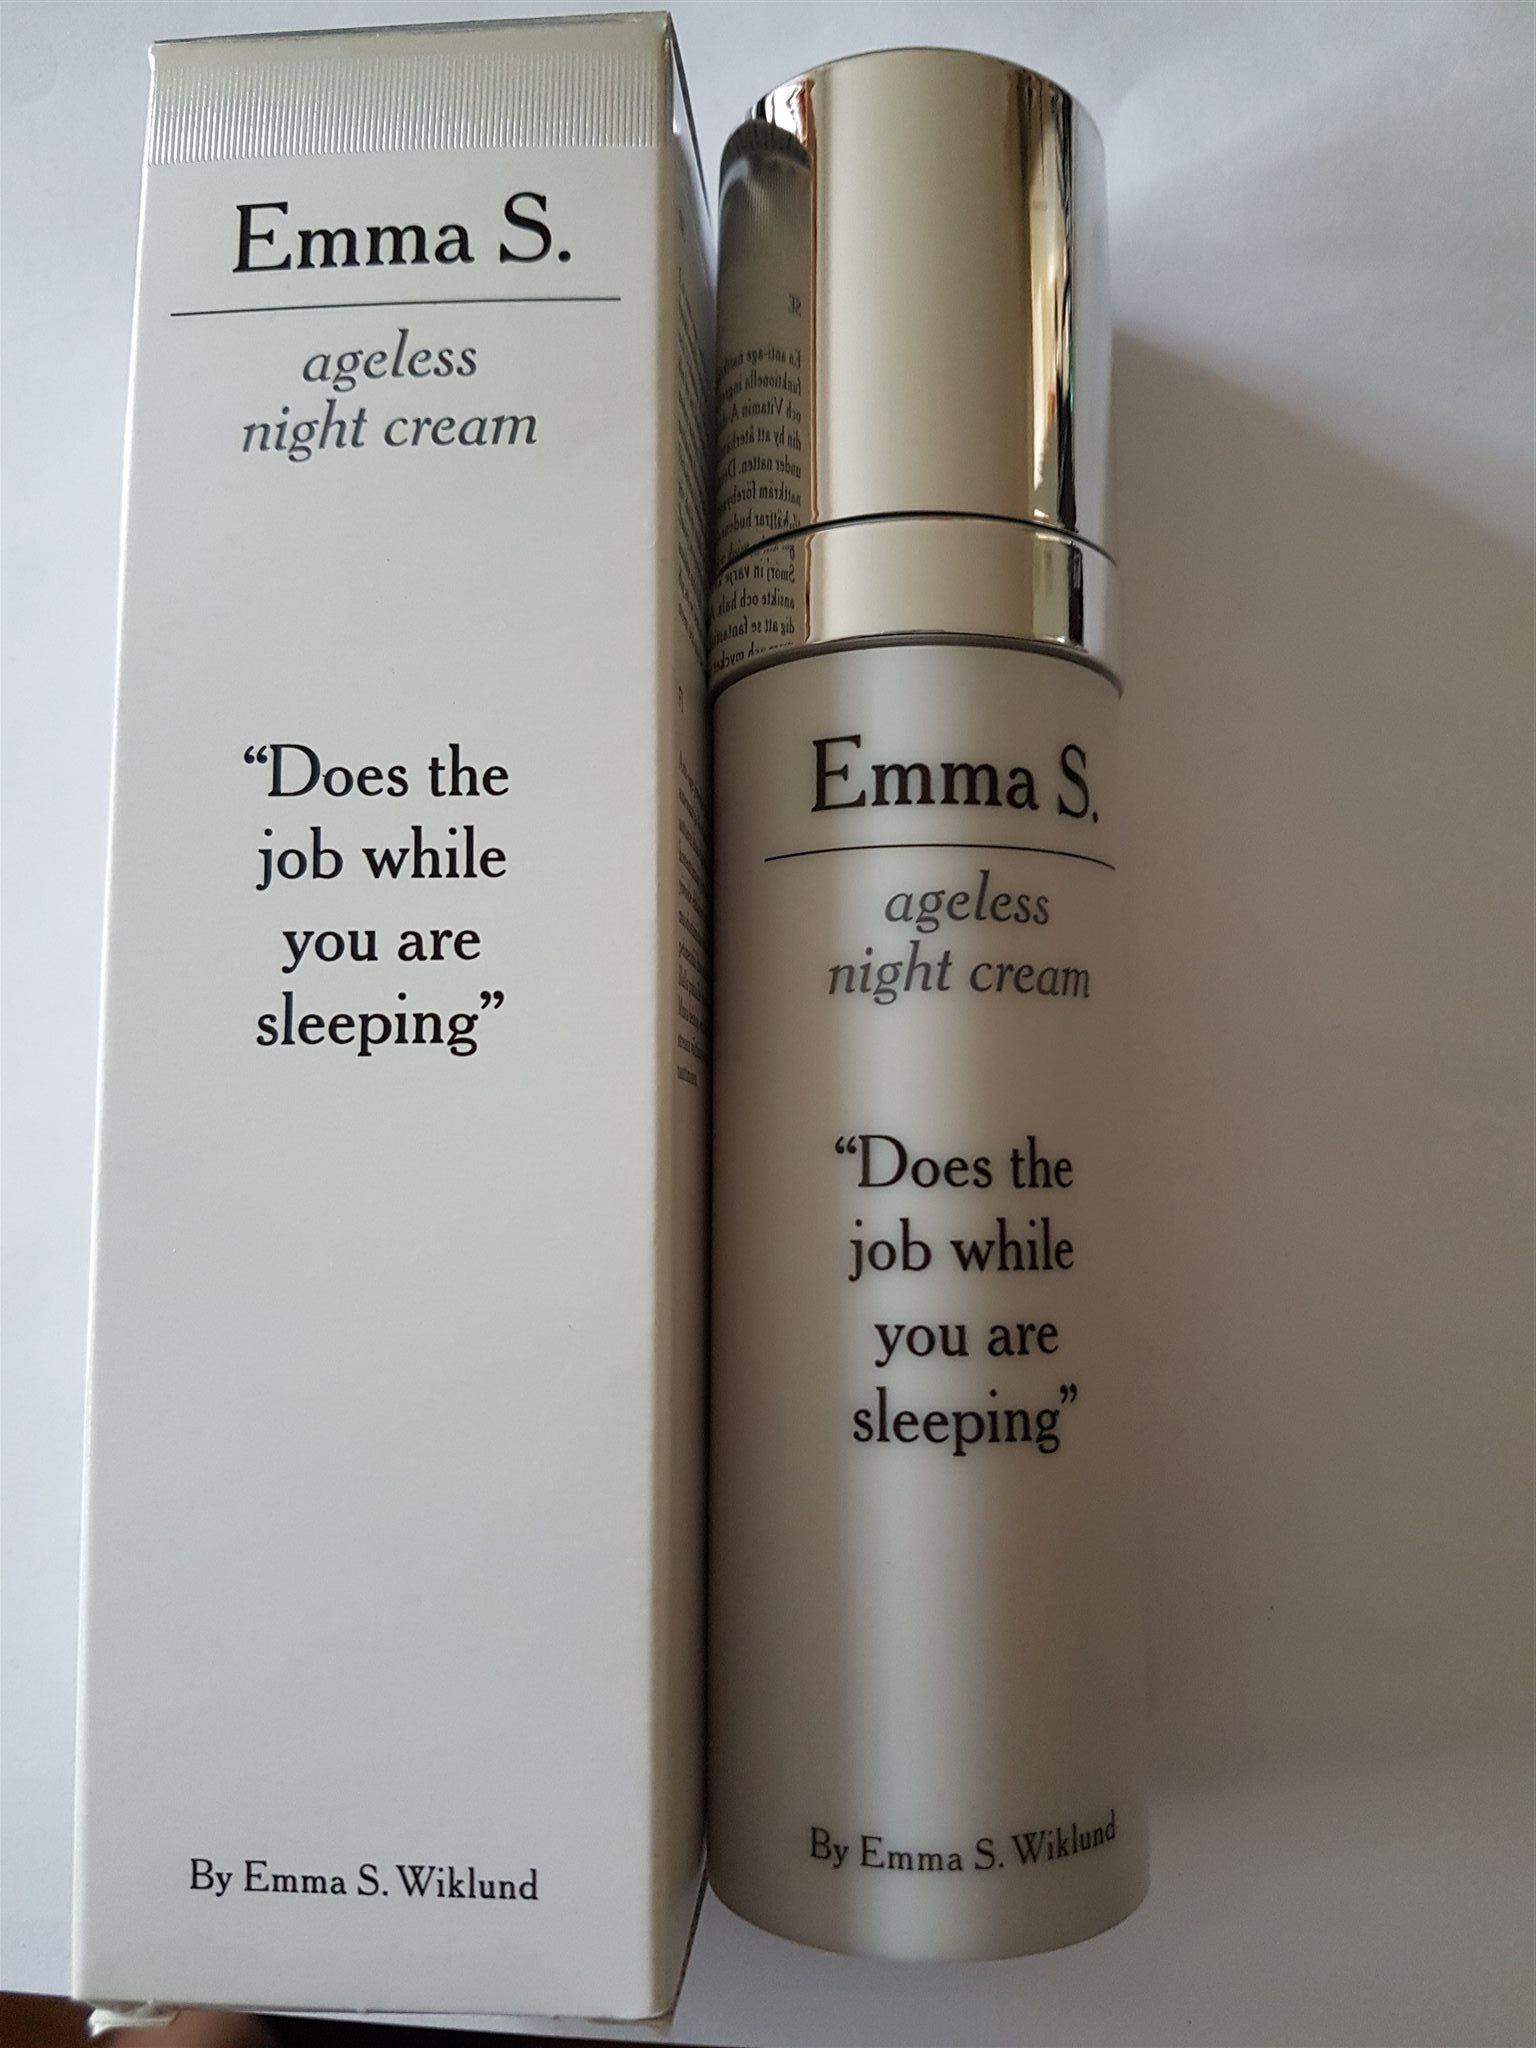 emma s ageless night cream